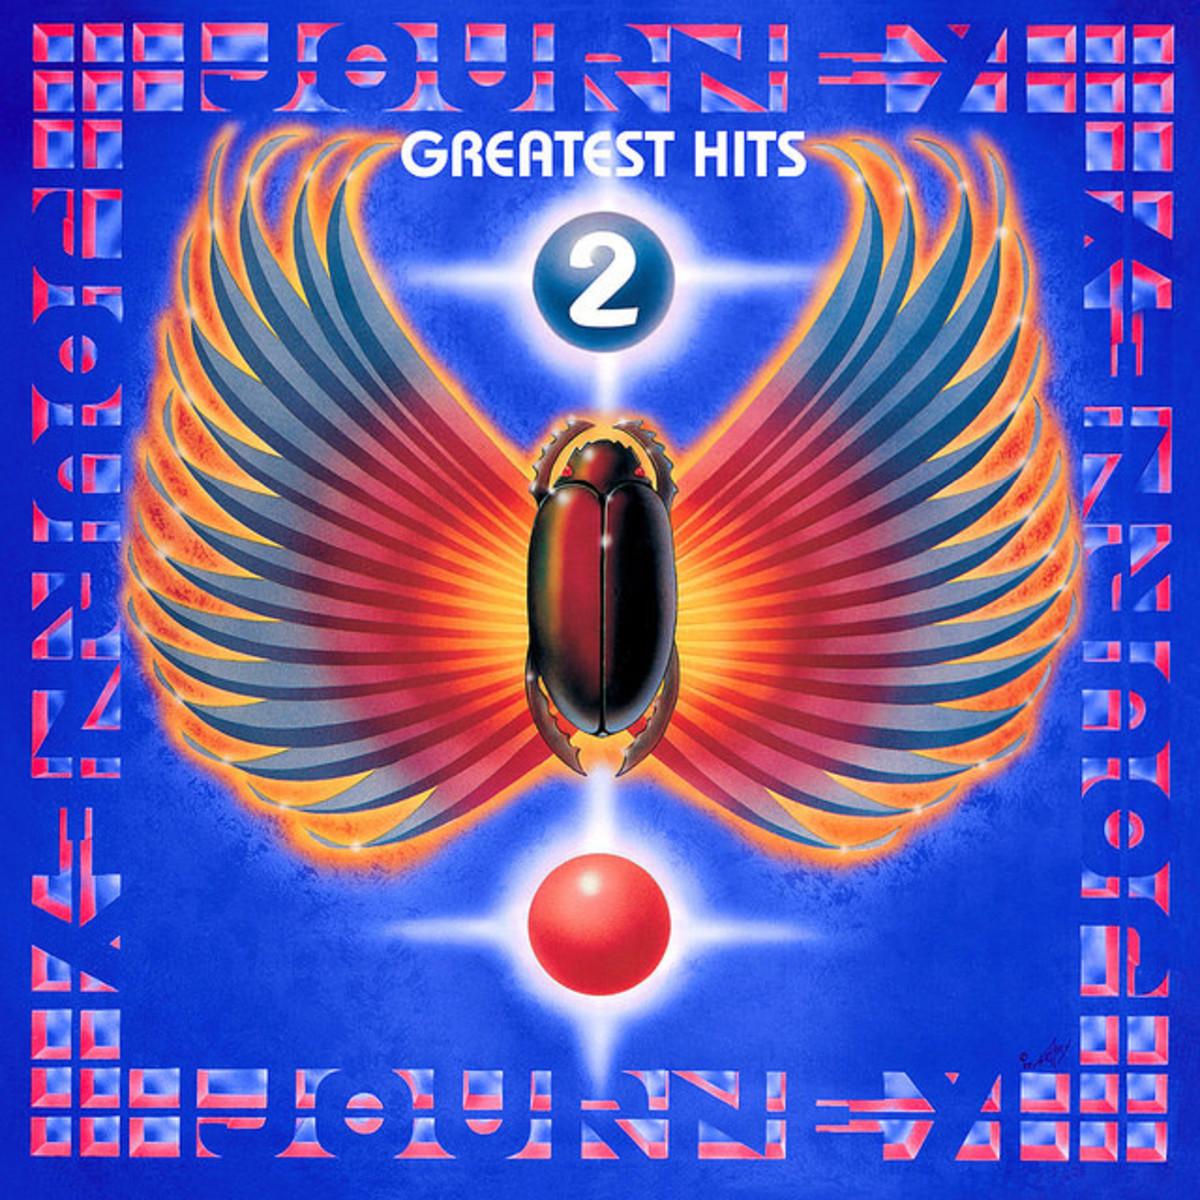 "Journey ""Greatest Hits 2"" Sony Music Entertainment, Columbia, Legacy 88697934231 2 12"" LP Vinyl Record Set US Pressing (2011) Album Cover Art by Alton Kelley"